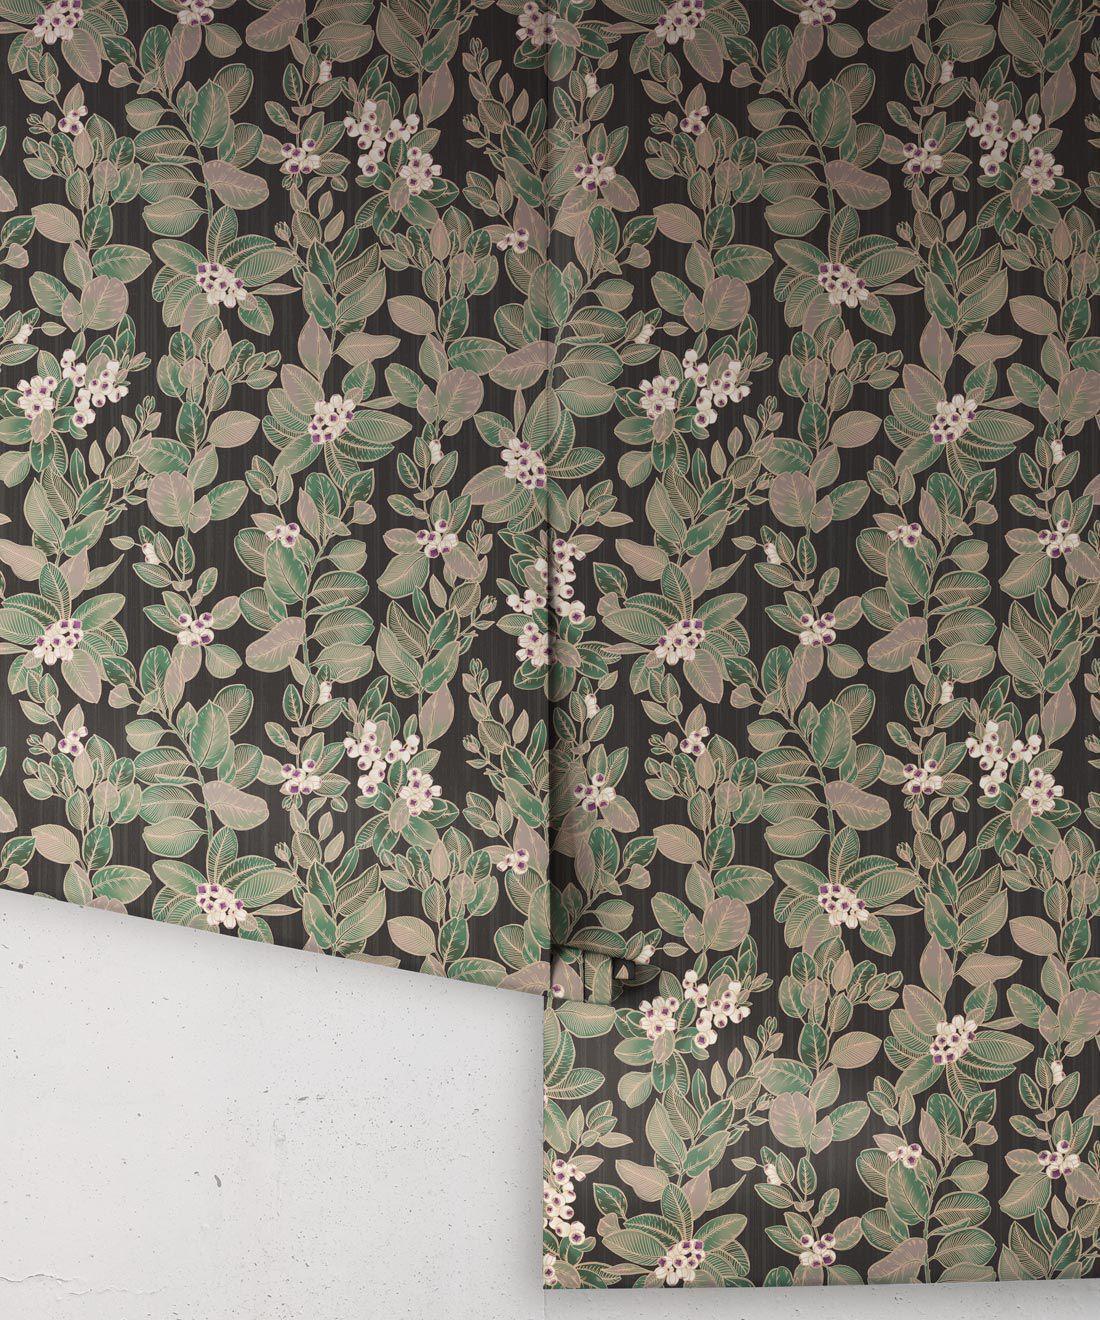 Eucalyptus Wallpaper • Eloise Short • Vintage Floral Wallpaper •Granny Chic Wallpaper • Grandmillennial Style Wallpaper •Pebble •Rolls